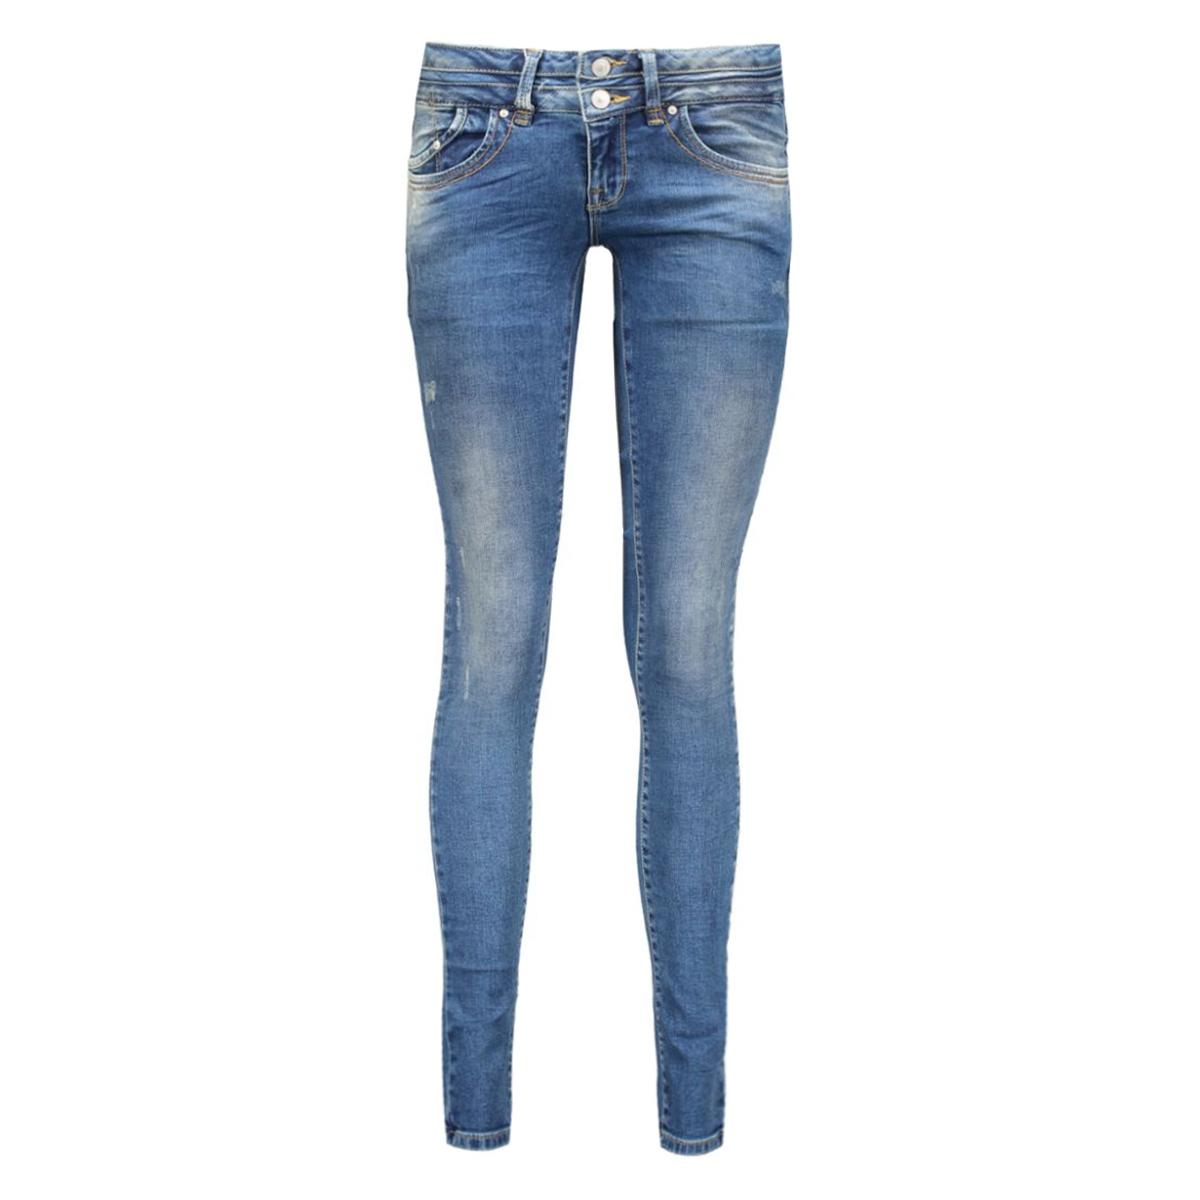 100951069.13497 ltb jeans 50069